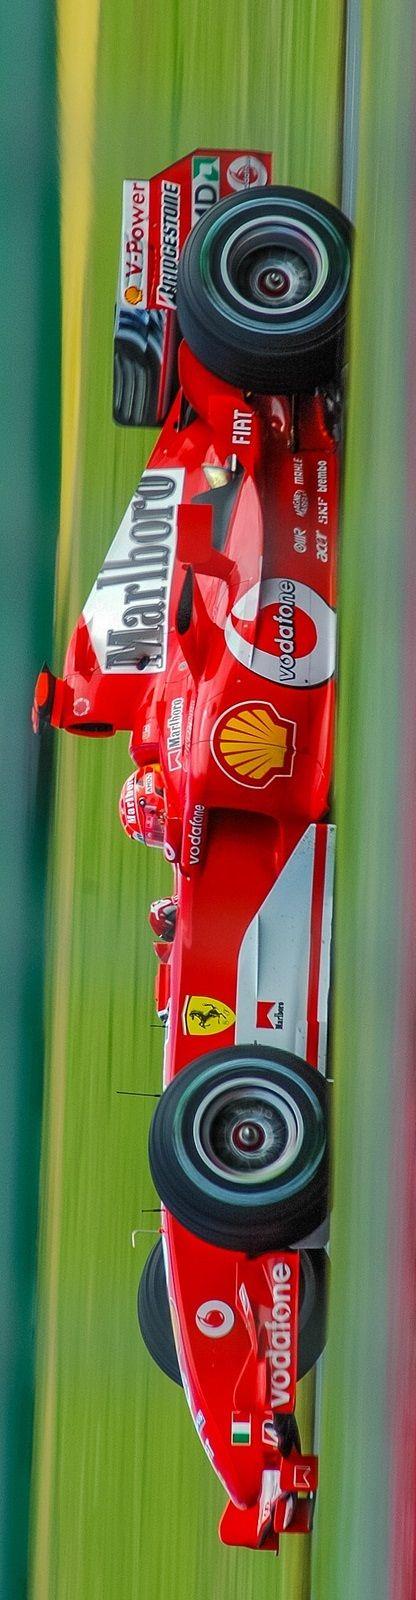 F1 2004 Ferrari Michael Schumacher